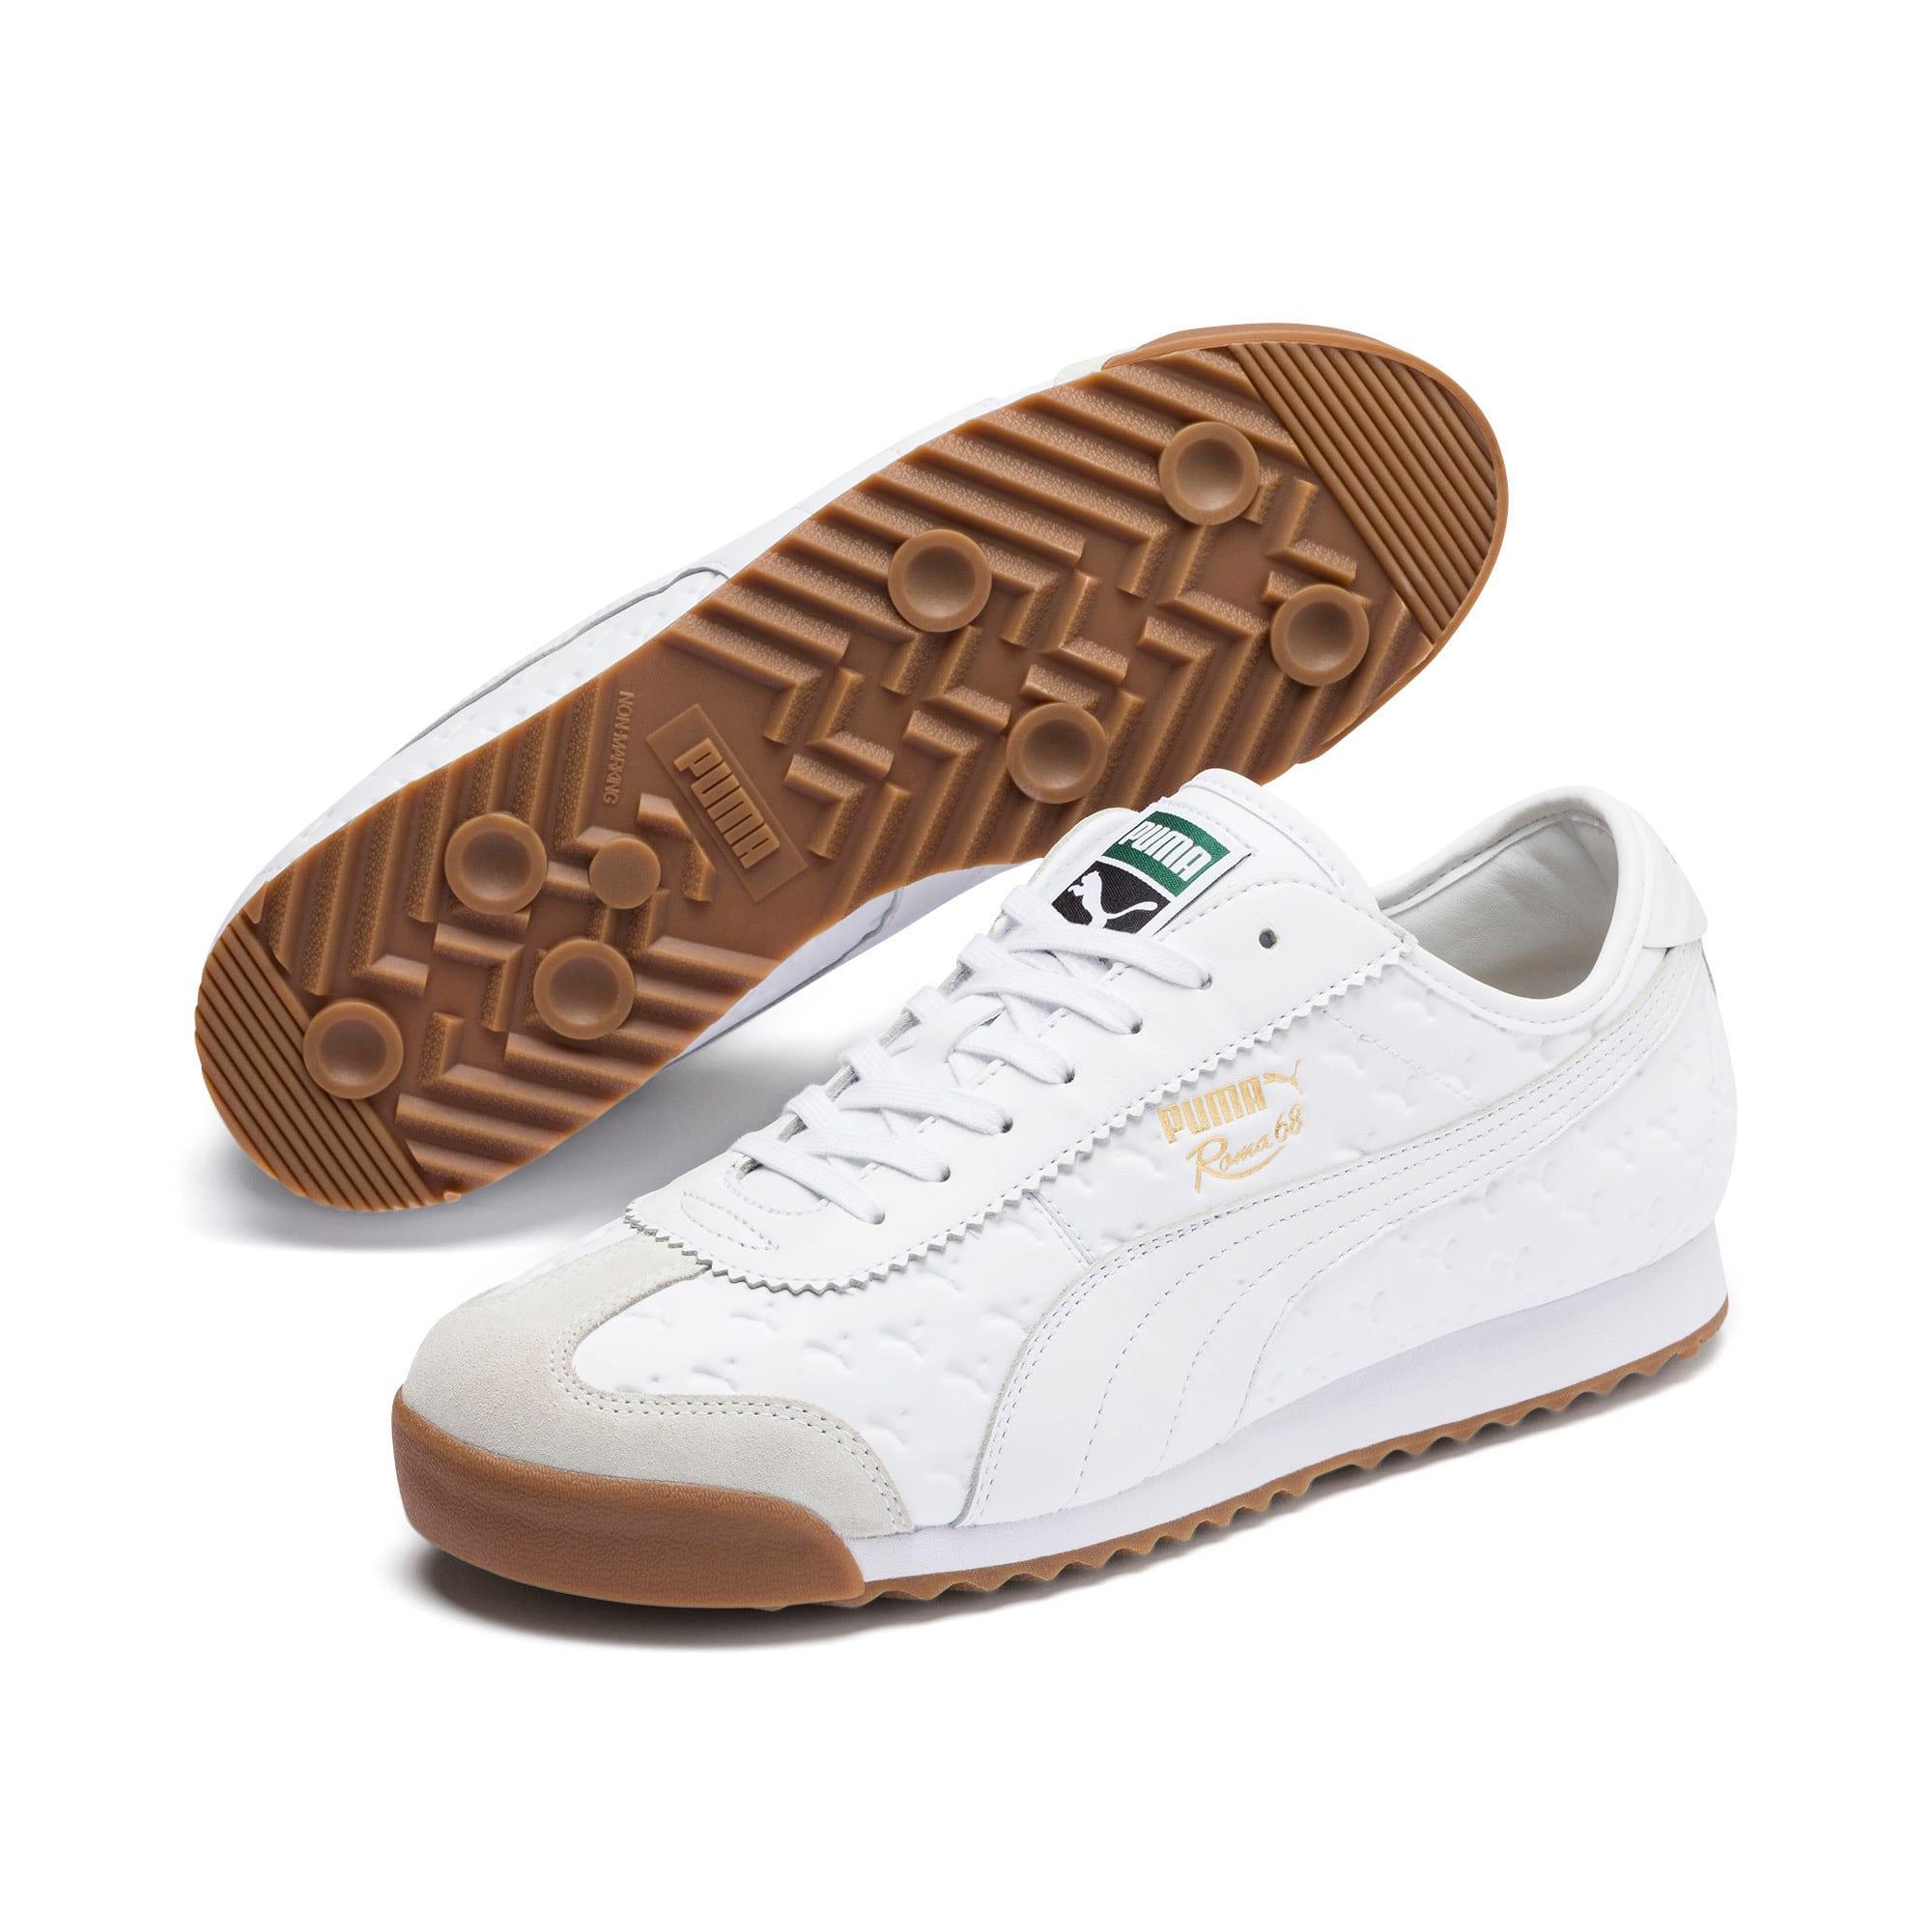 Thumbnail 3 of Roma '68 Gum Sneakers, Puma White-Puma White, medium